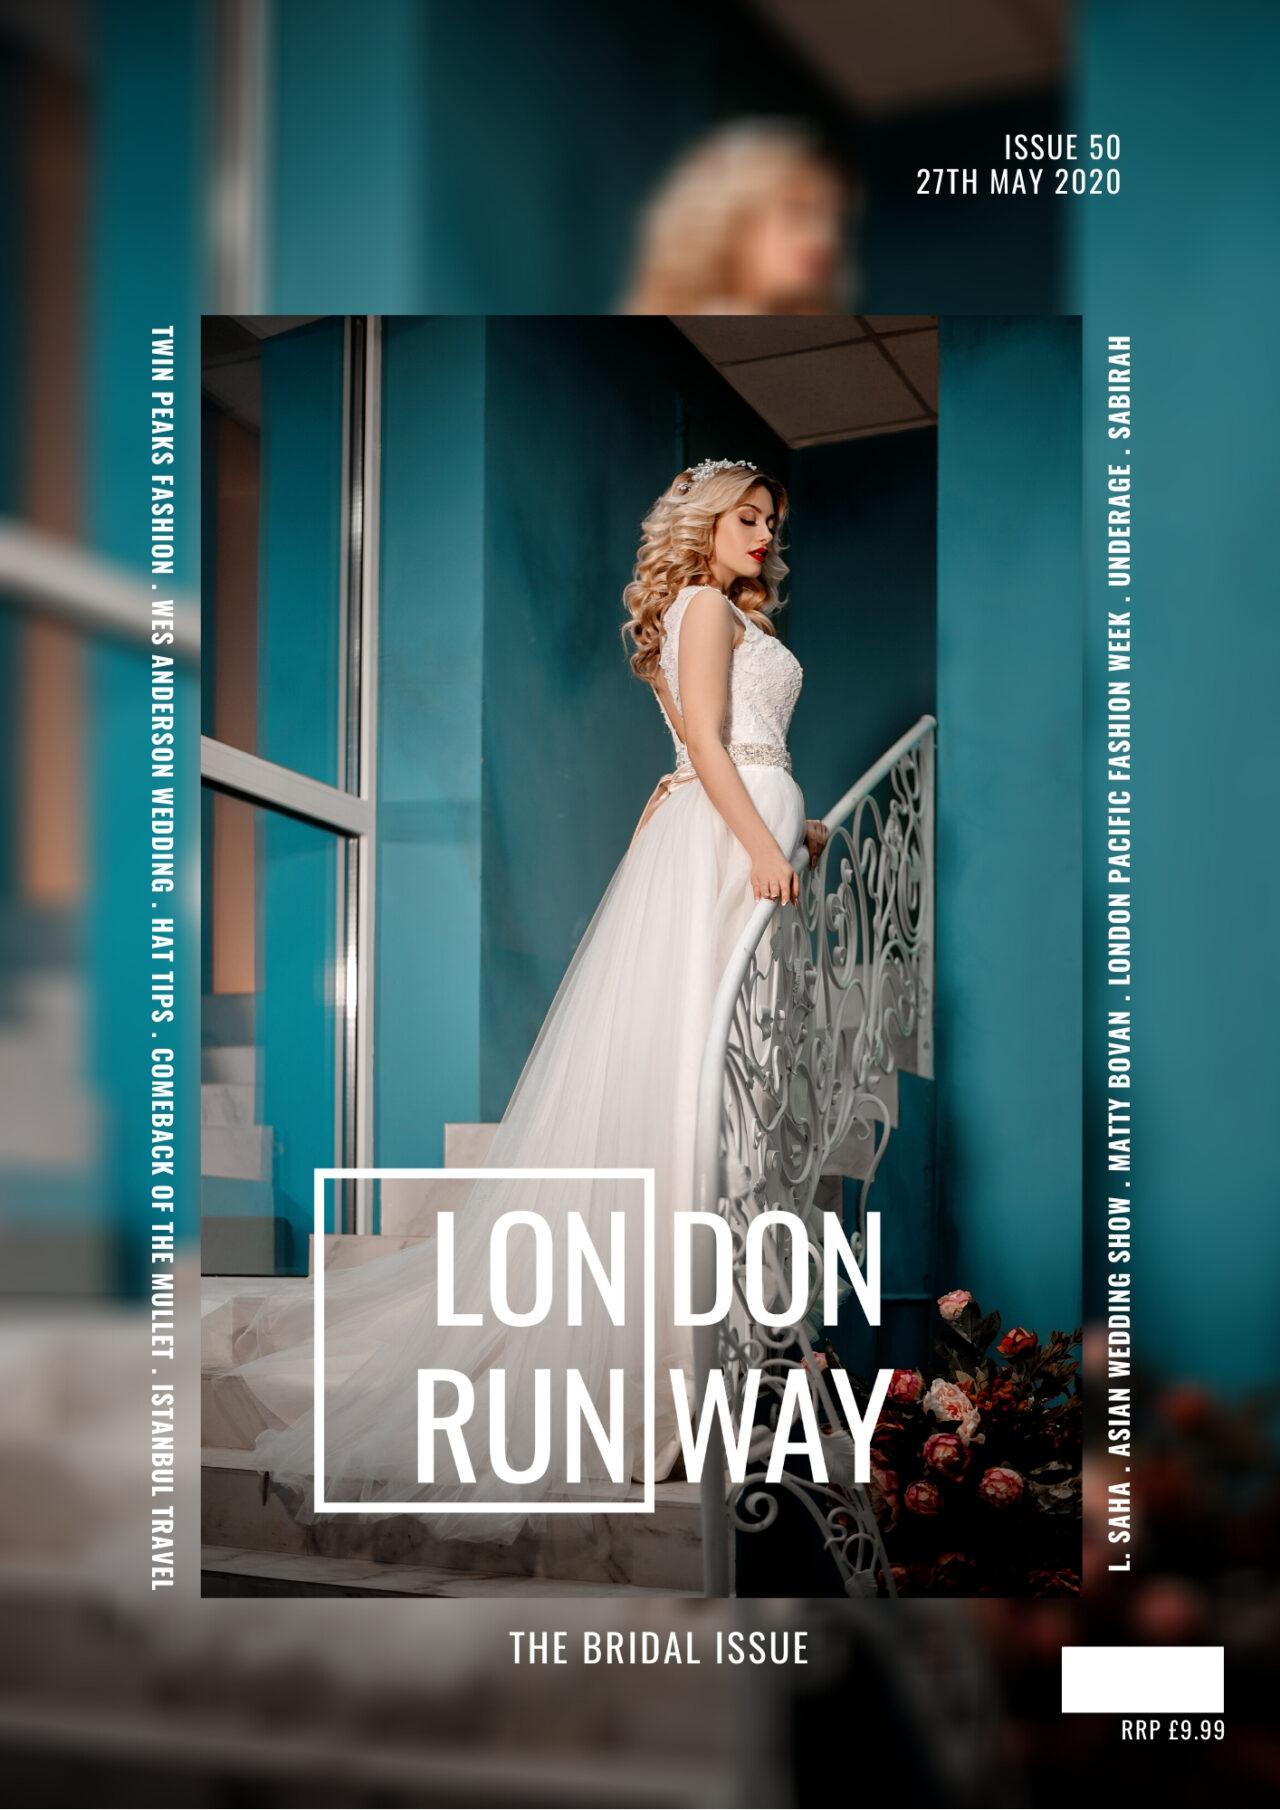 London Runway